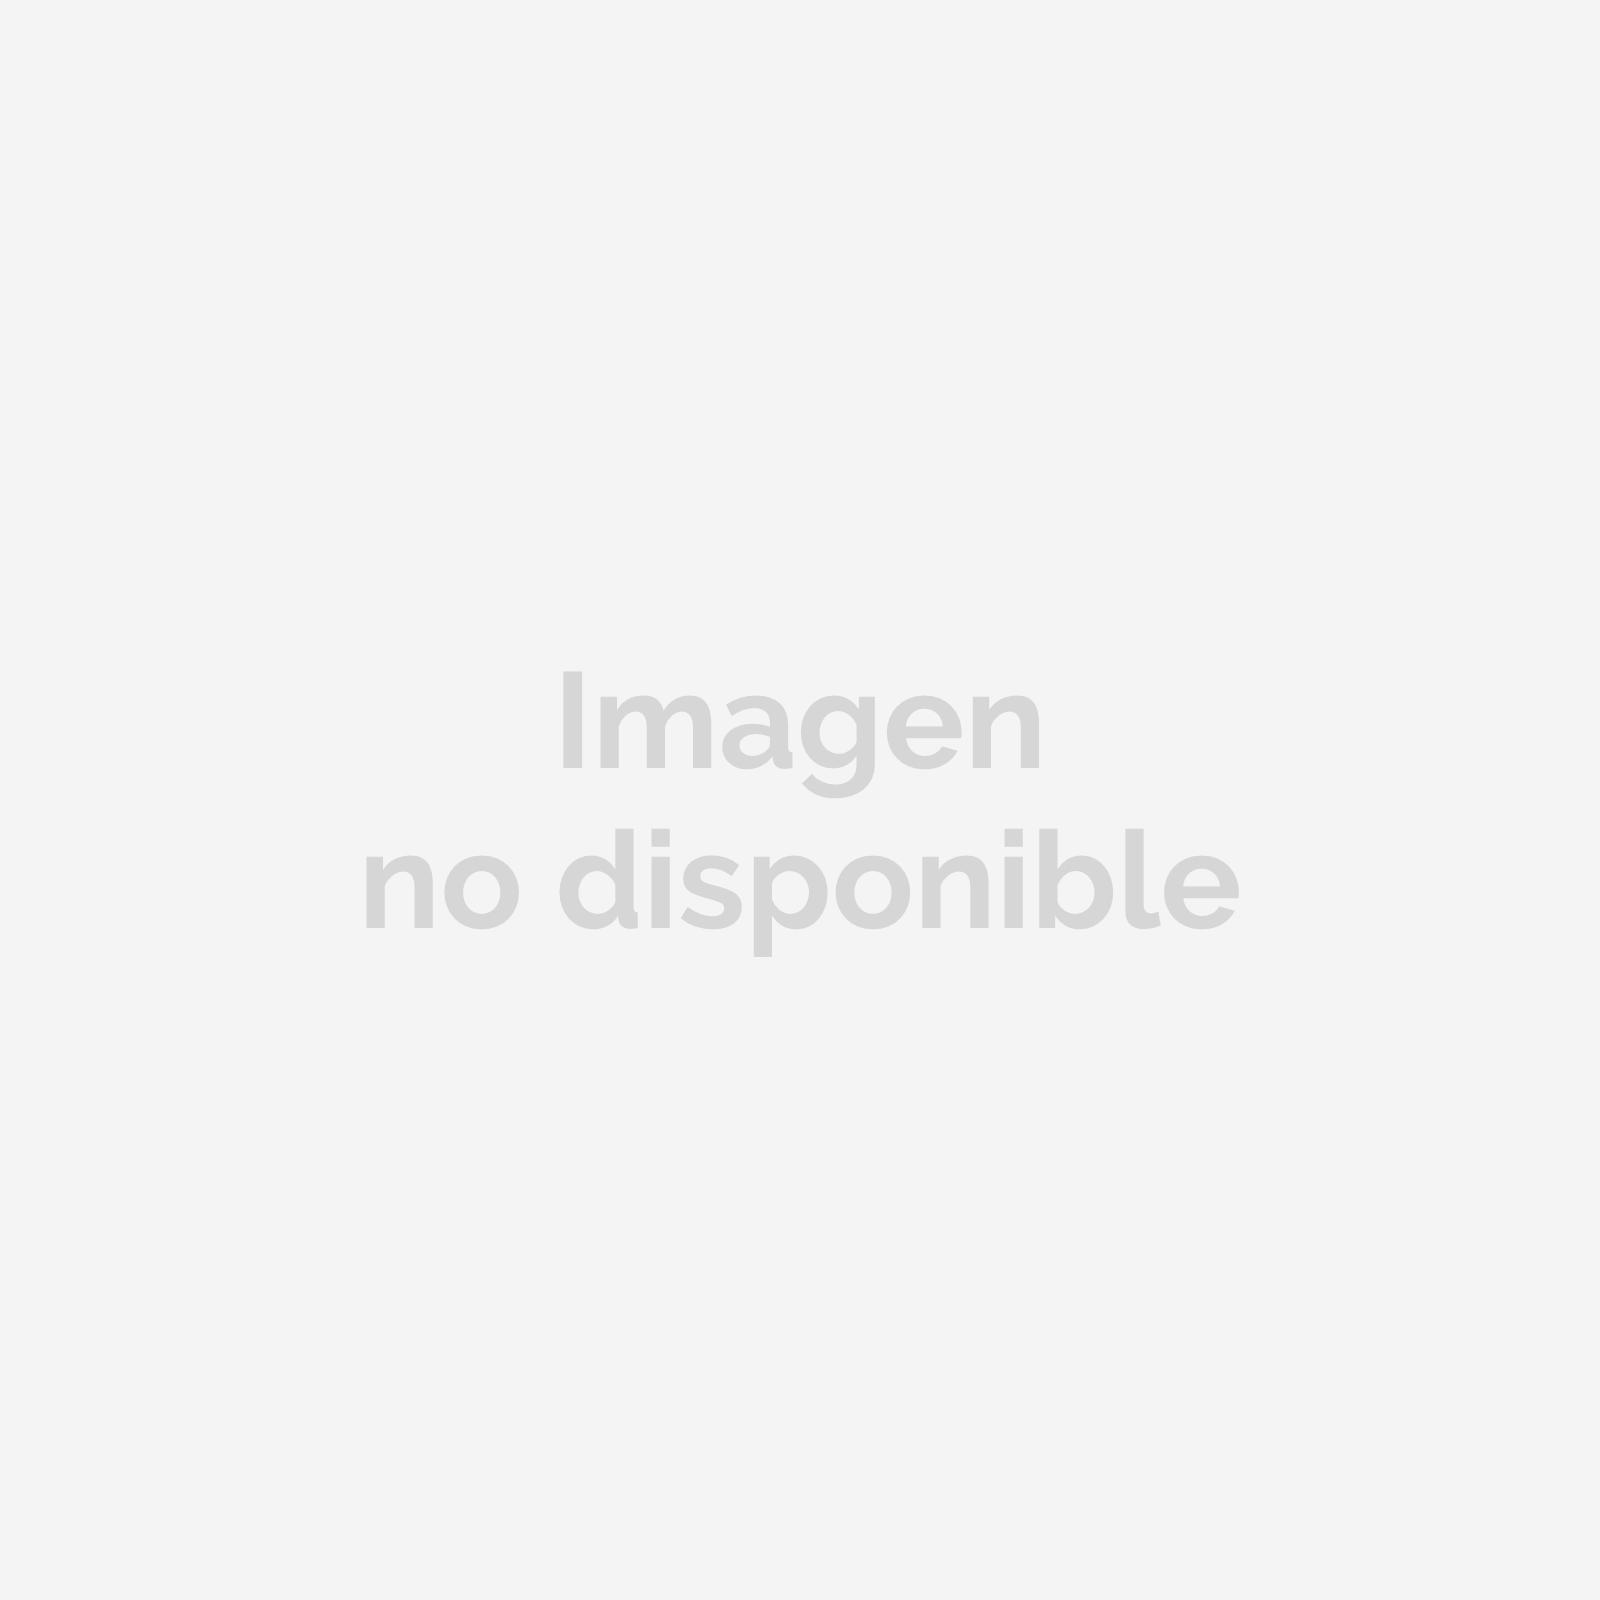 Difusor Vintage Vainilla